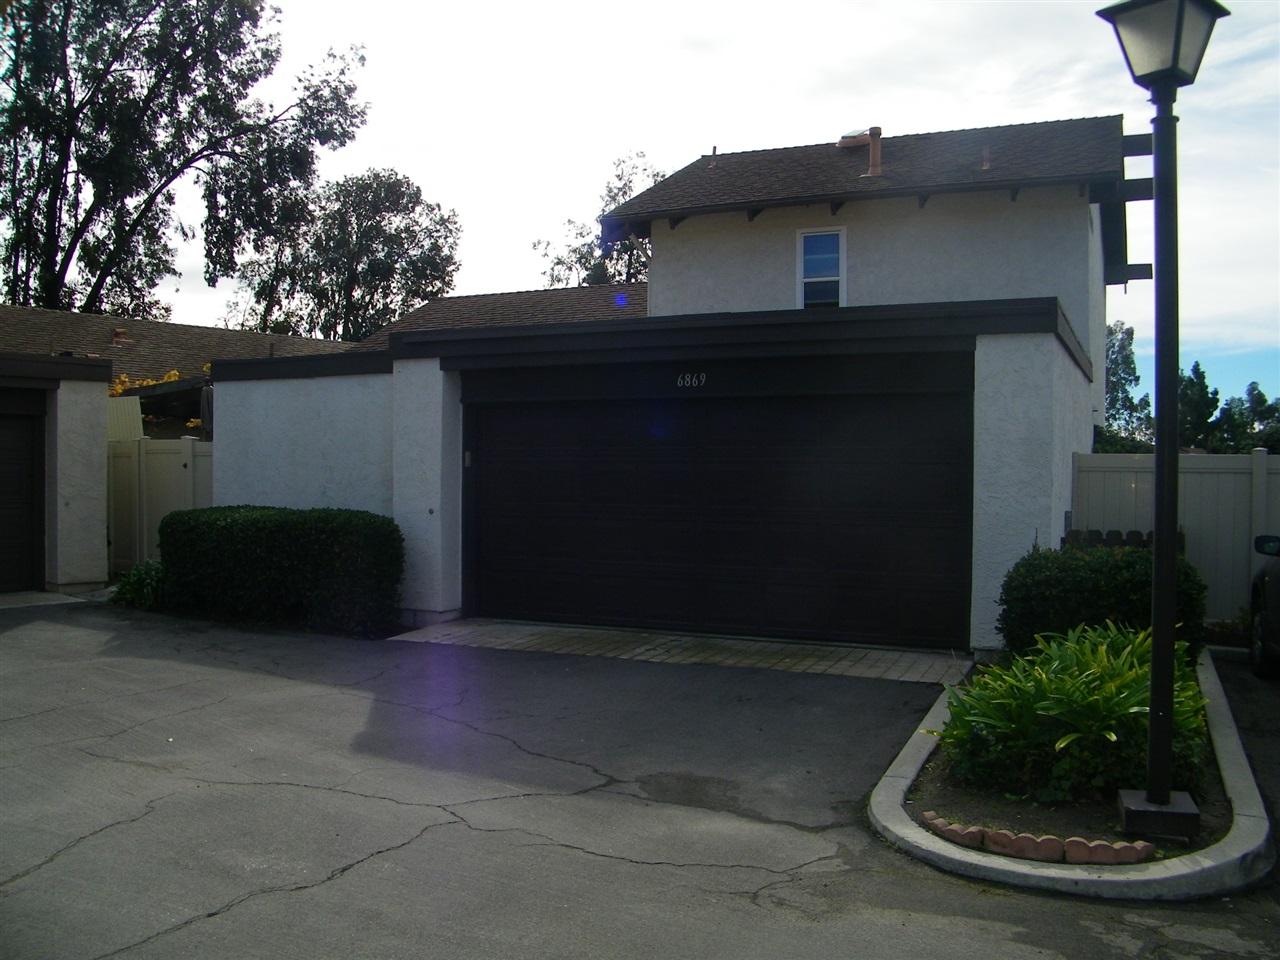 6869 Parkside Ave, San Diego, CA